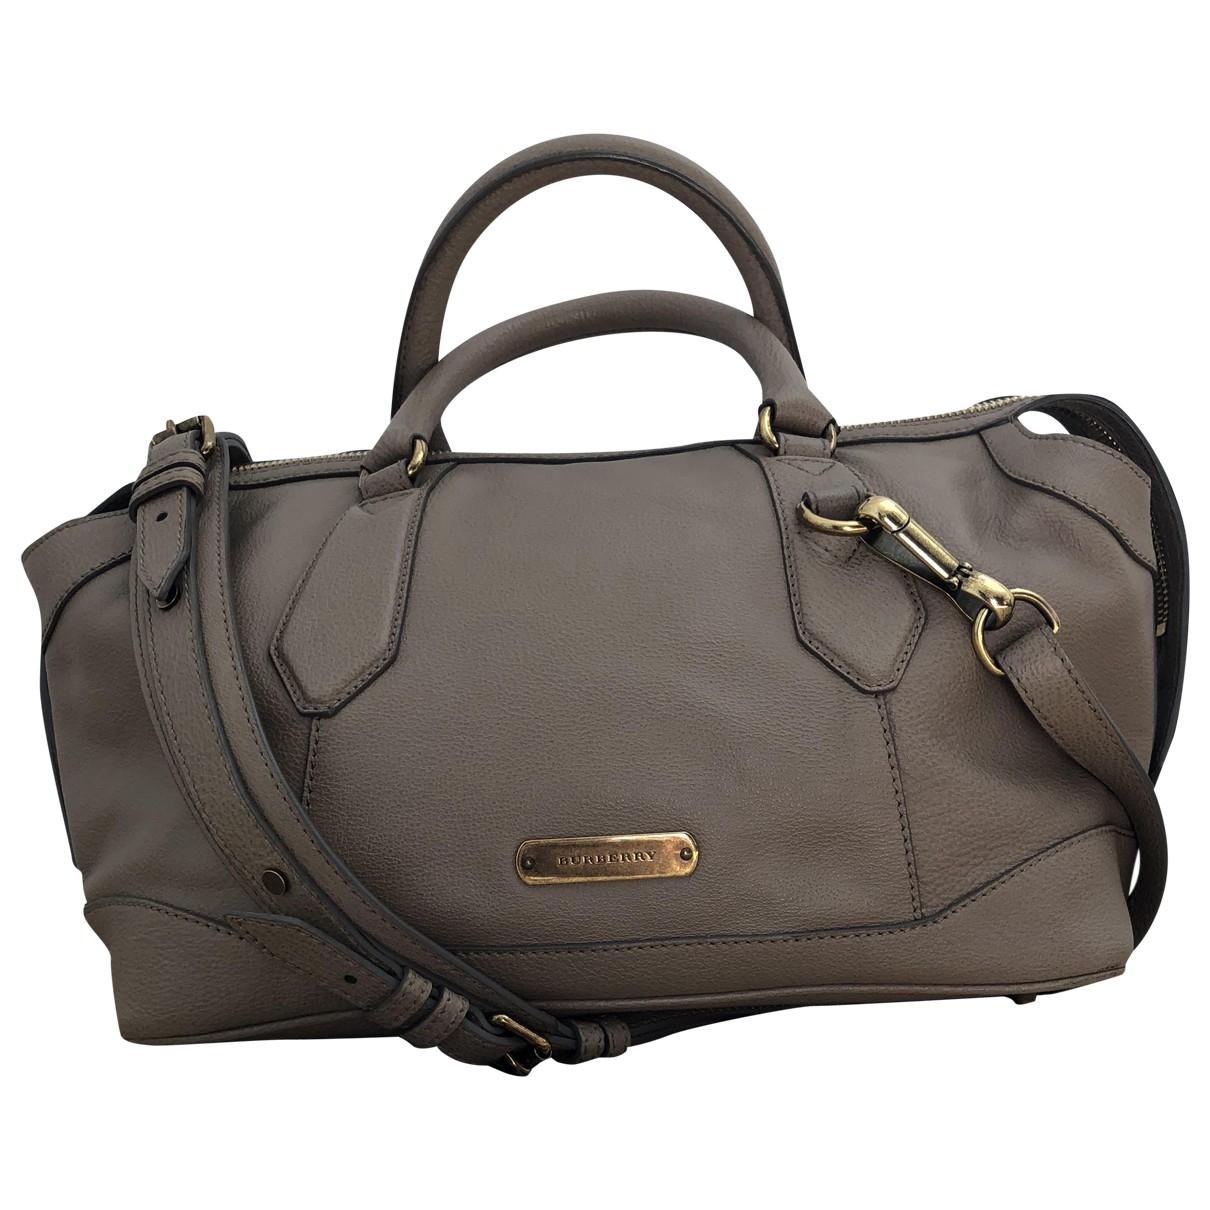 Burberry \N Beige Leather handbag for Women \N